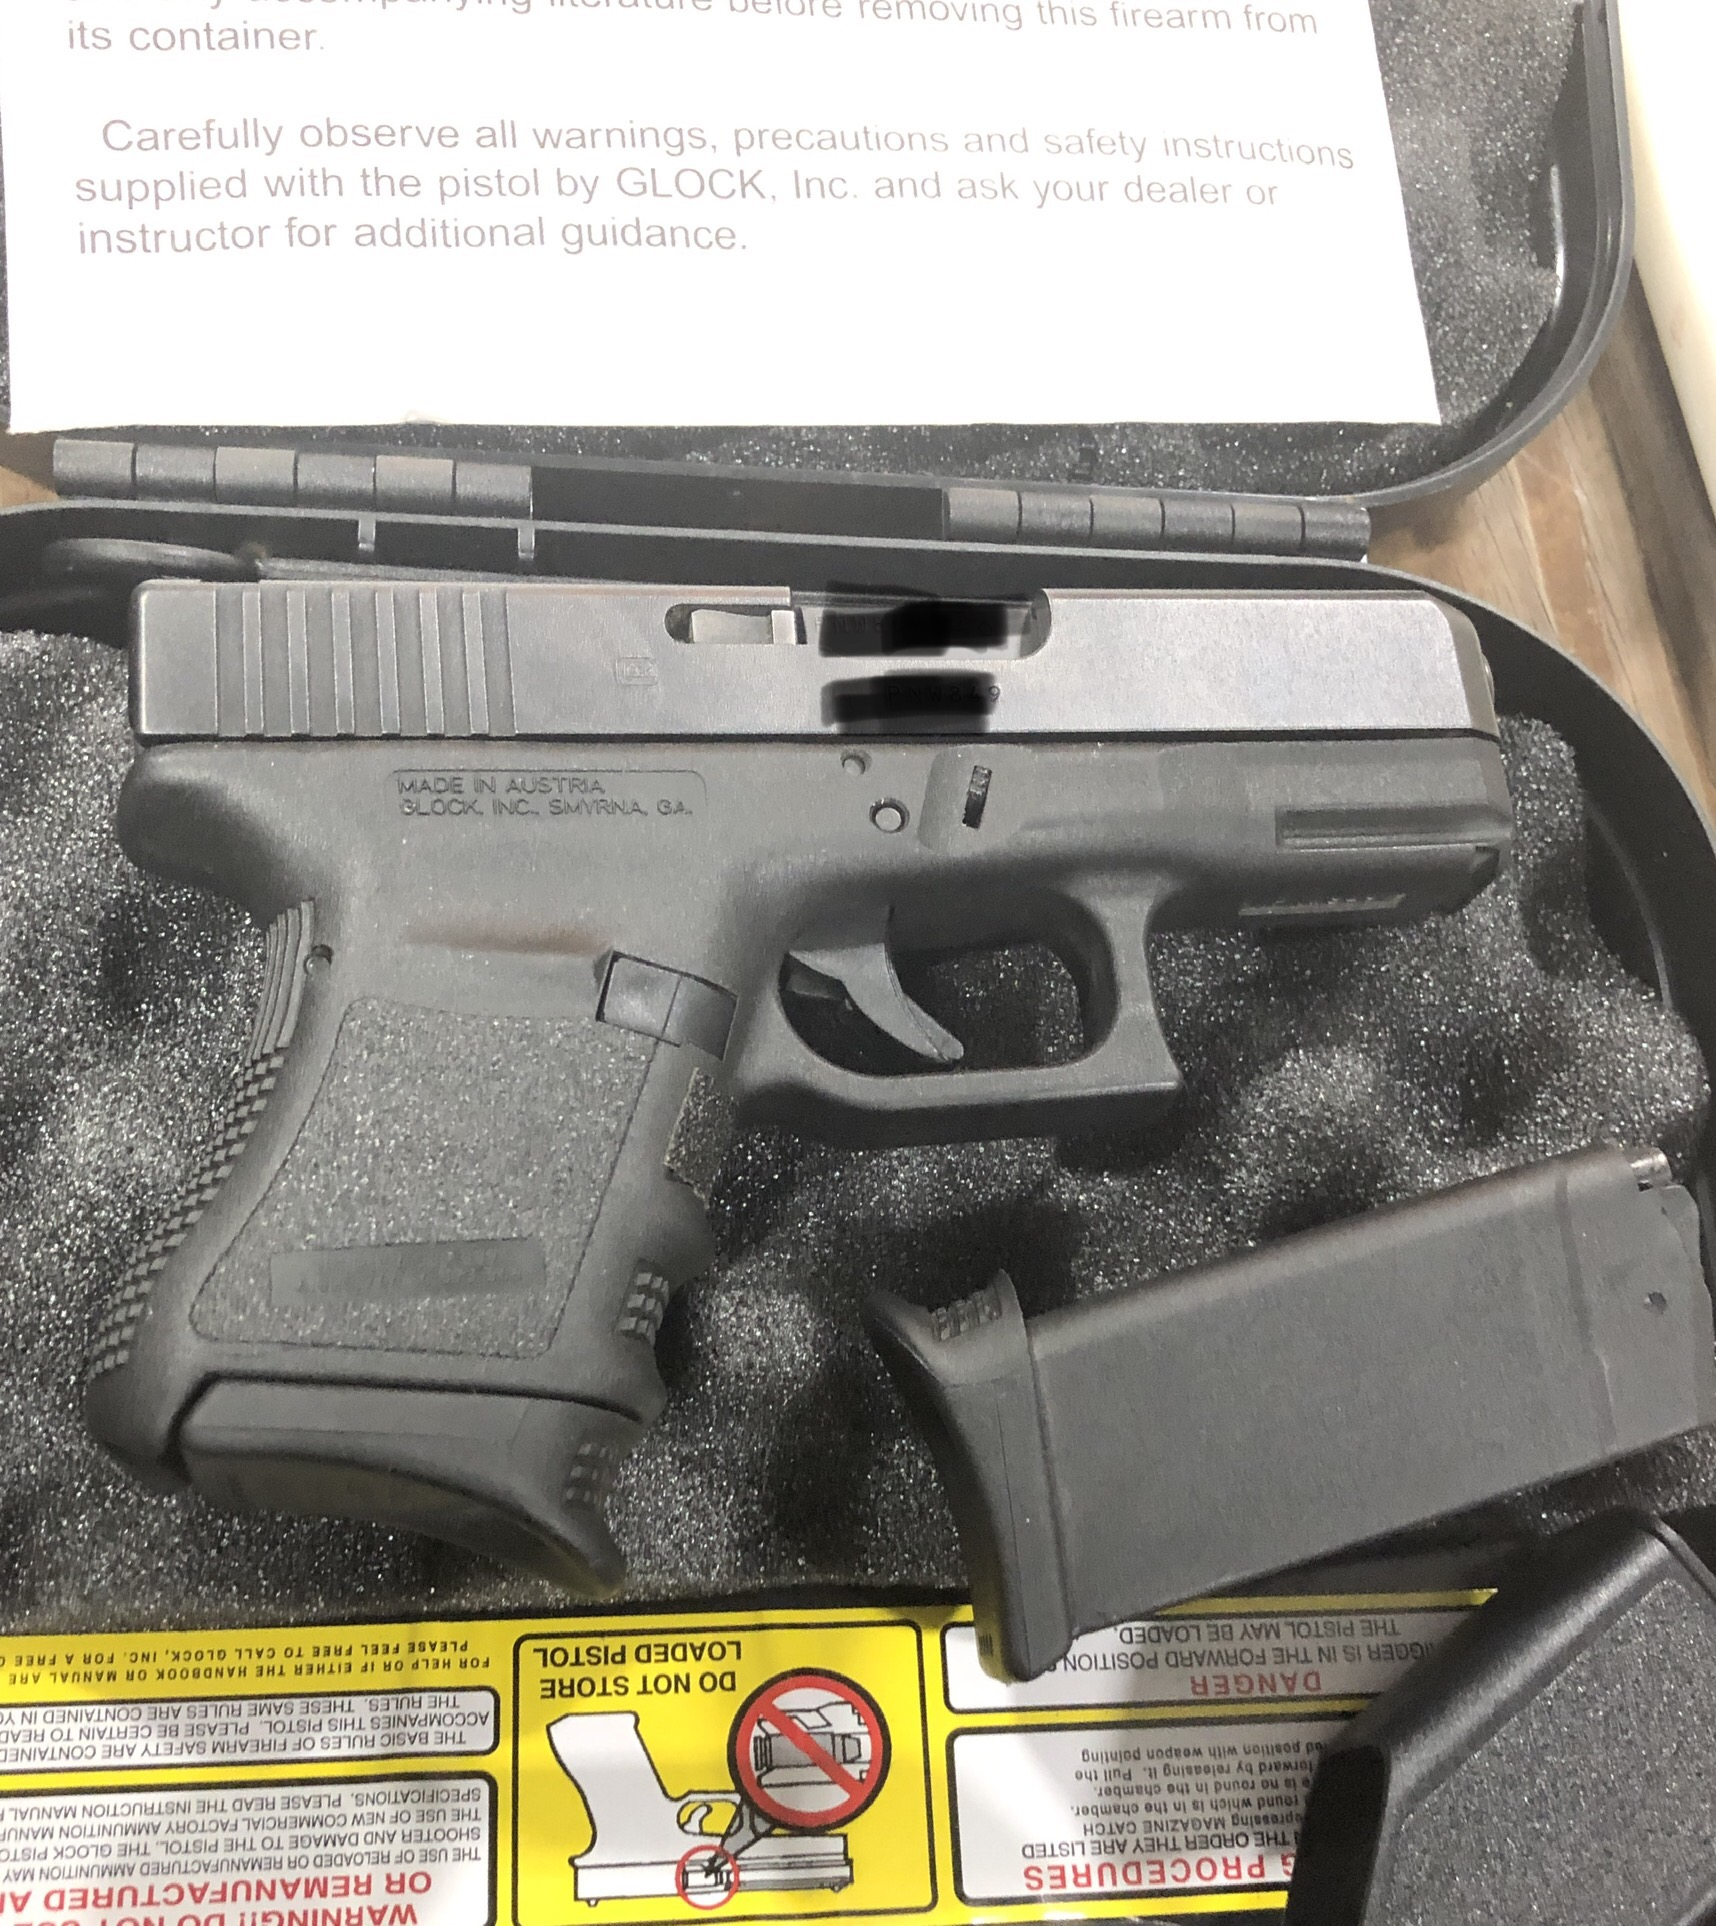 Glock Sights or just Sights!-4ee94174-a435-4130-89f5-fd5bc6b17078.jpeg